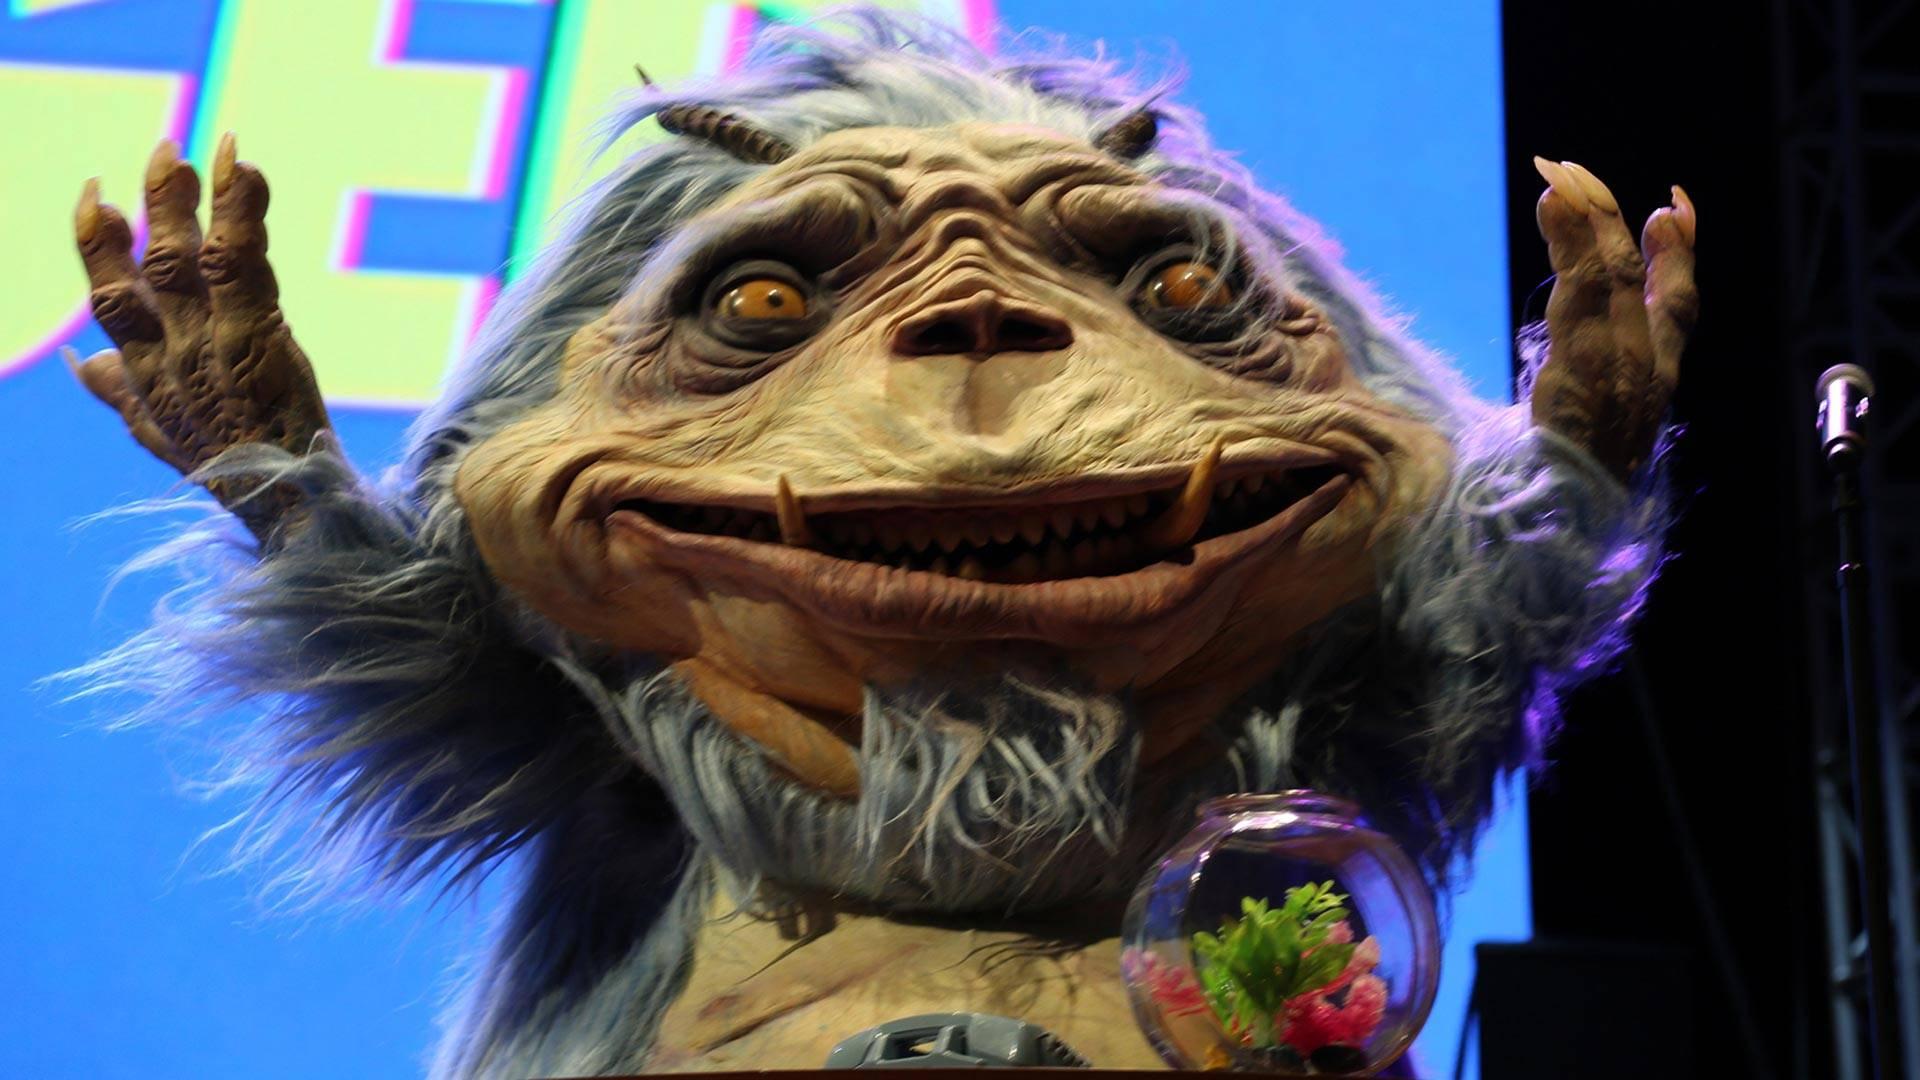 T.J. Miller as the alien Gorburger. Kevin L. Jones/KQED